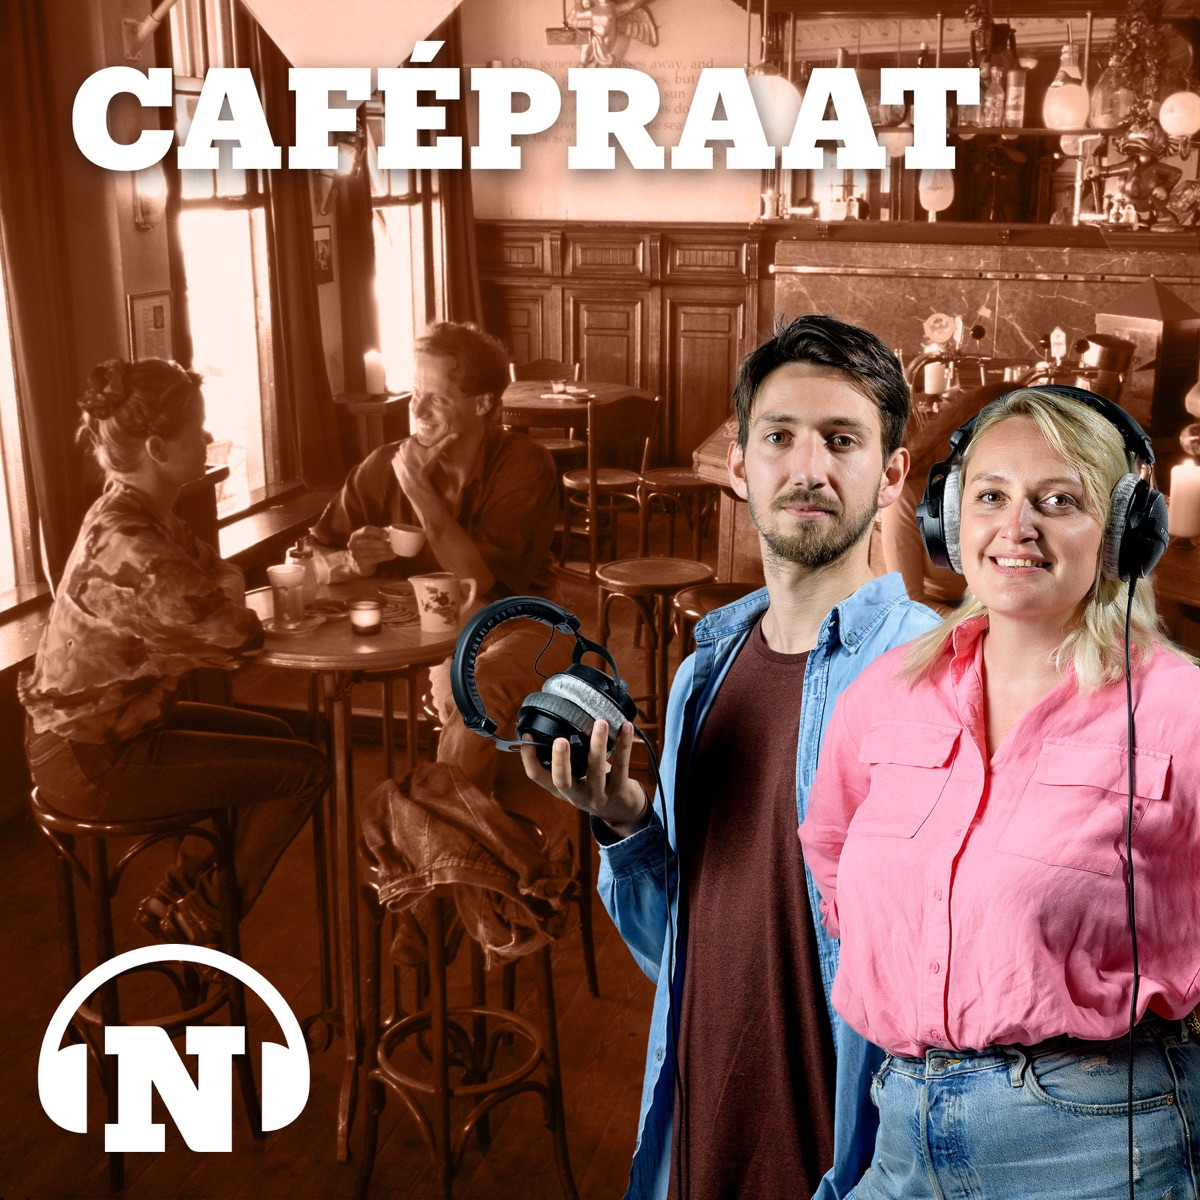 Cafépraat